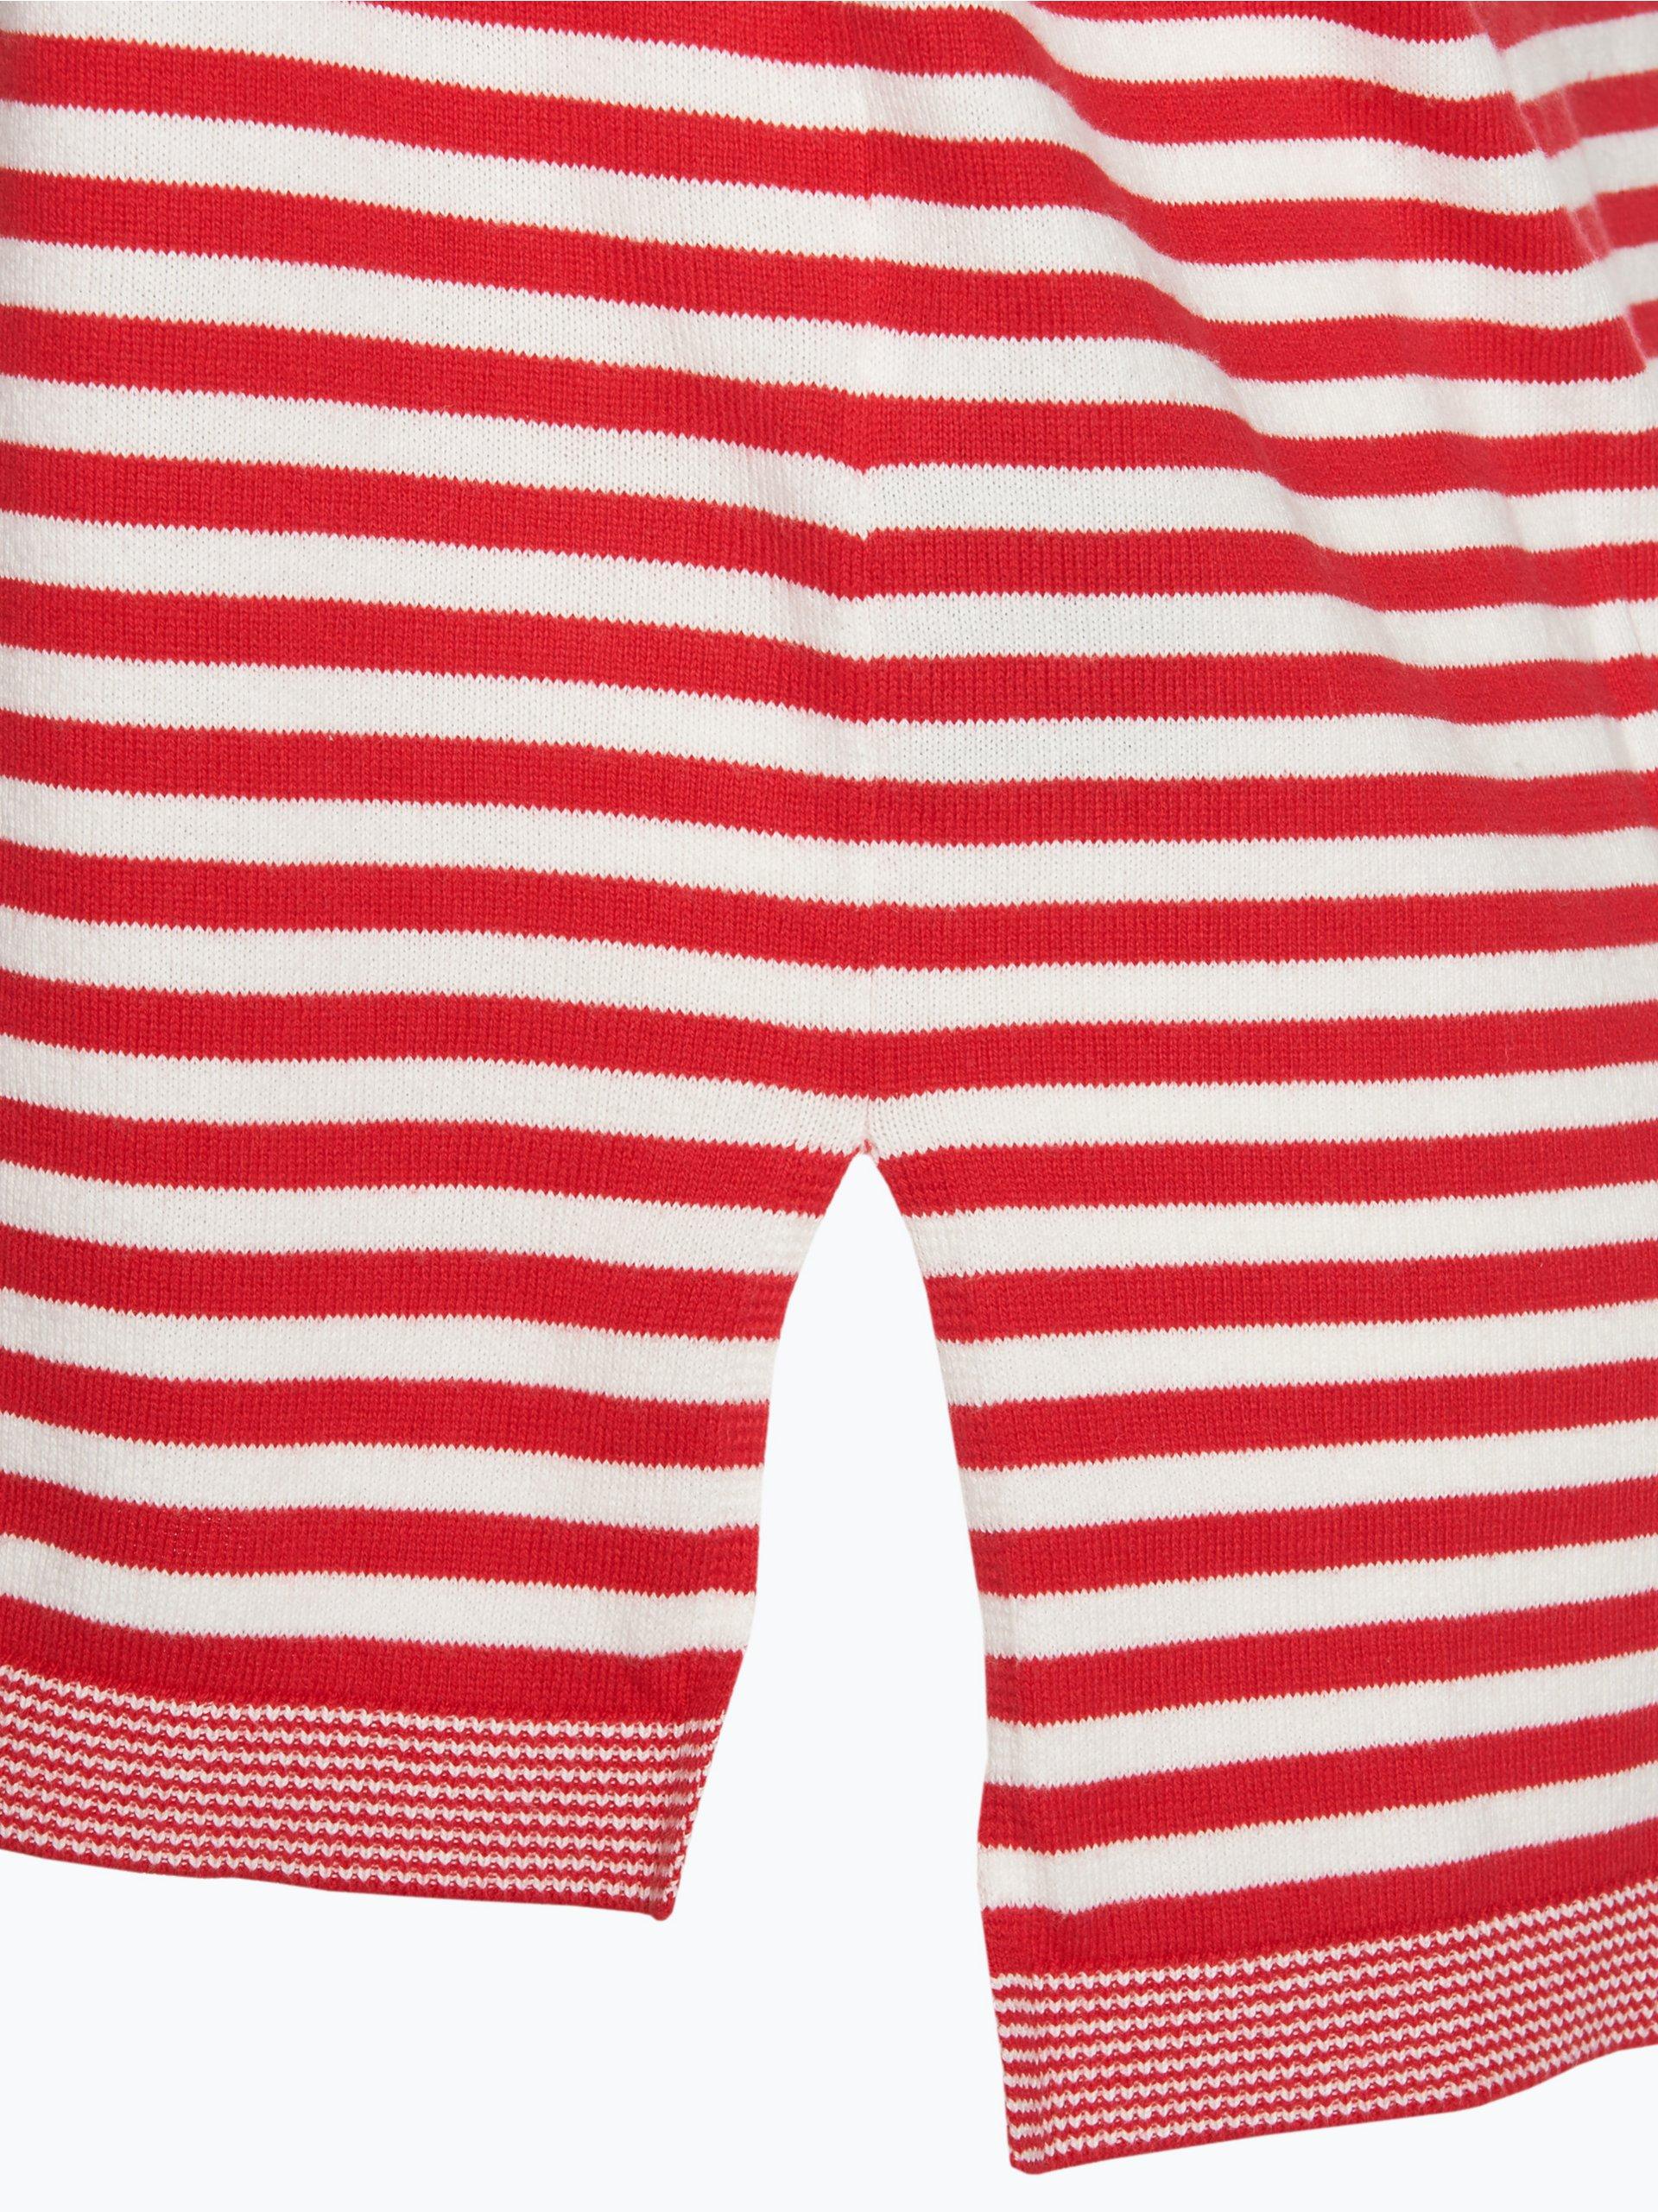 tommy jeans damen pullover rot gestreift online kaufen. Black Bedroom Furniture Sets. Home Design Ideas